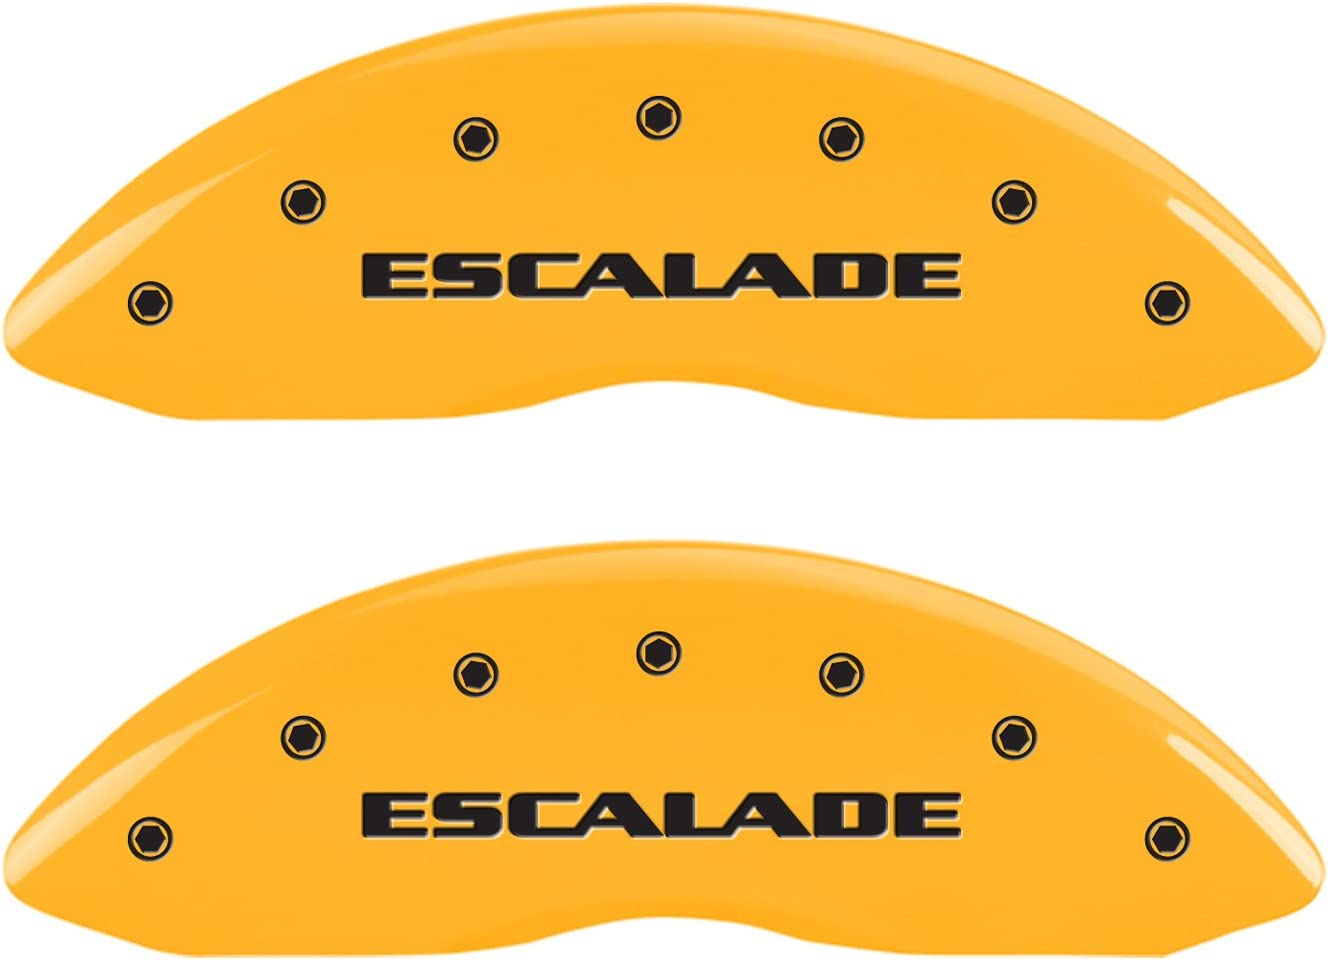 Set of 4, Engraved Front and Rear: Escalade, Yellow powder coat finish, black characters MGP Caliper Covers 35015SESCYL Yellow Caliper Cover